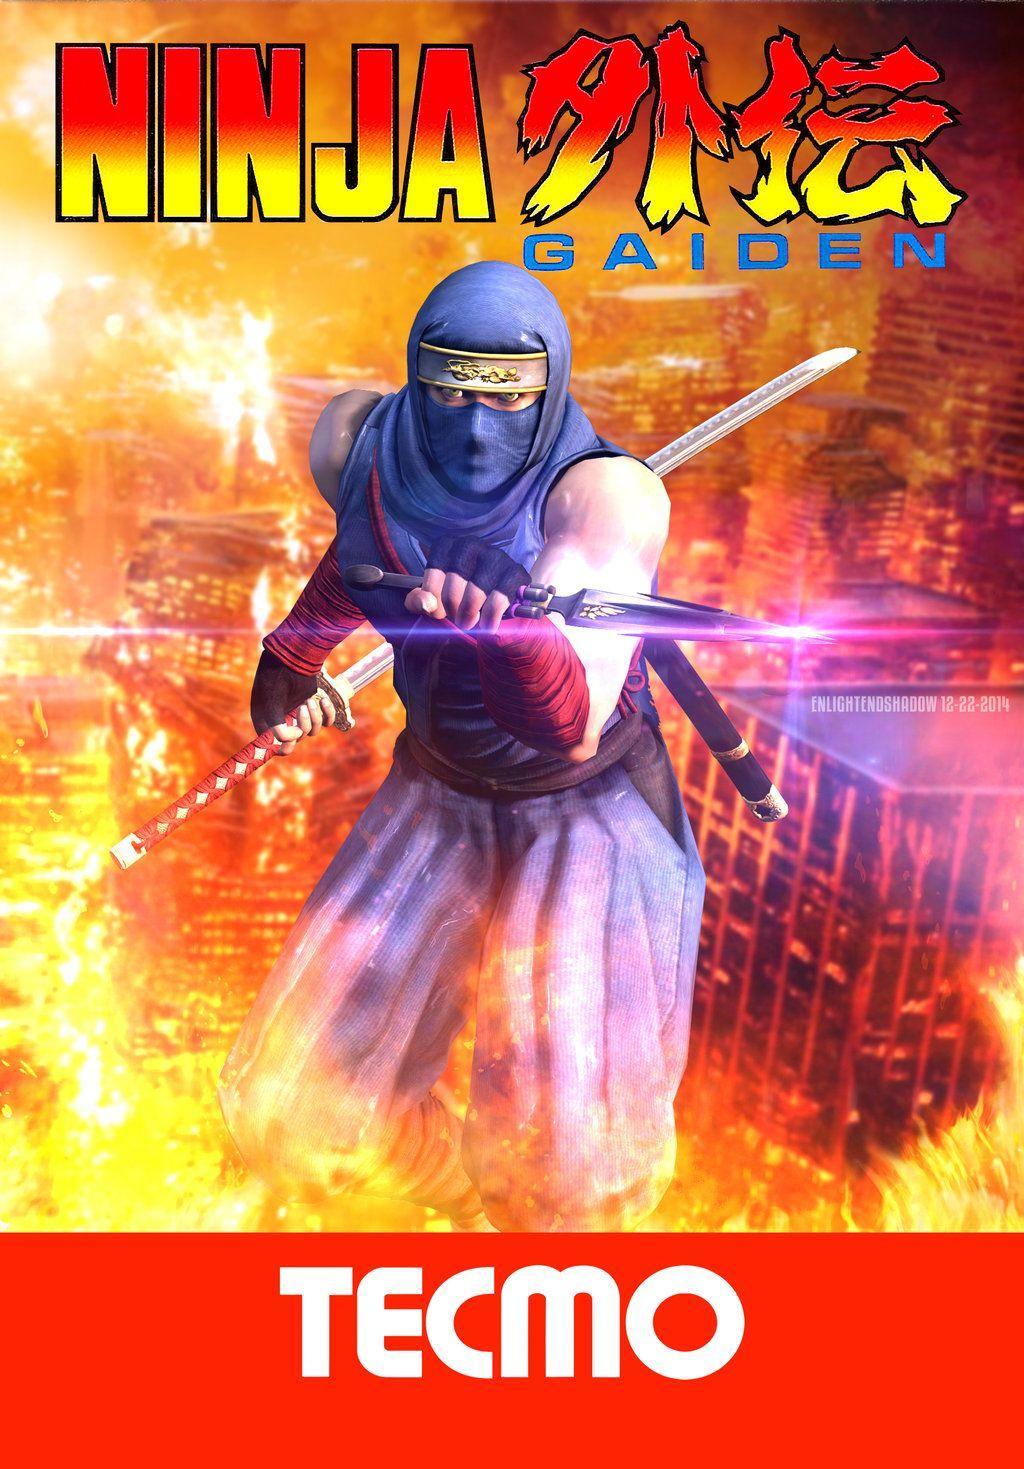 Game Ninja Gaiden Wallpaper: Ninja Gaiden Ryu Hayabusa Nes Fan Art Wallpapers